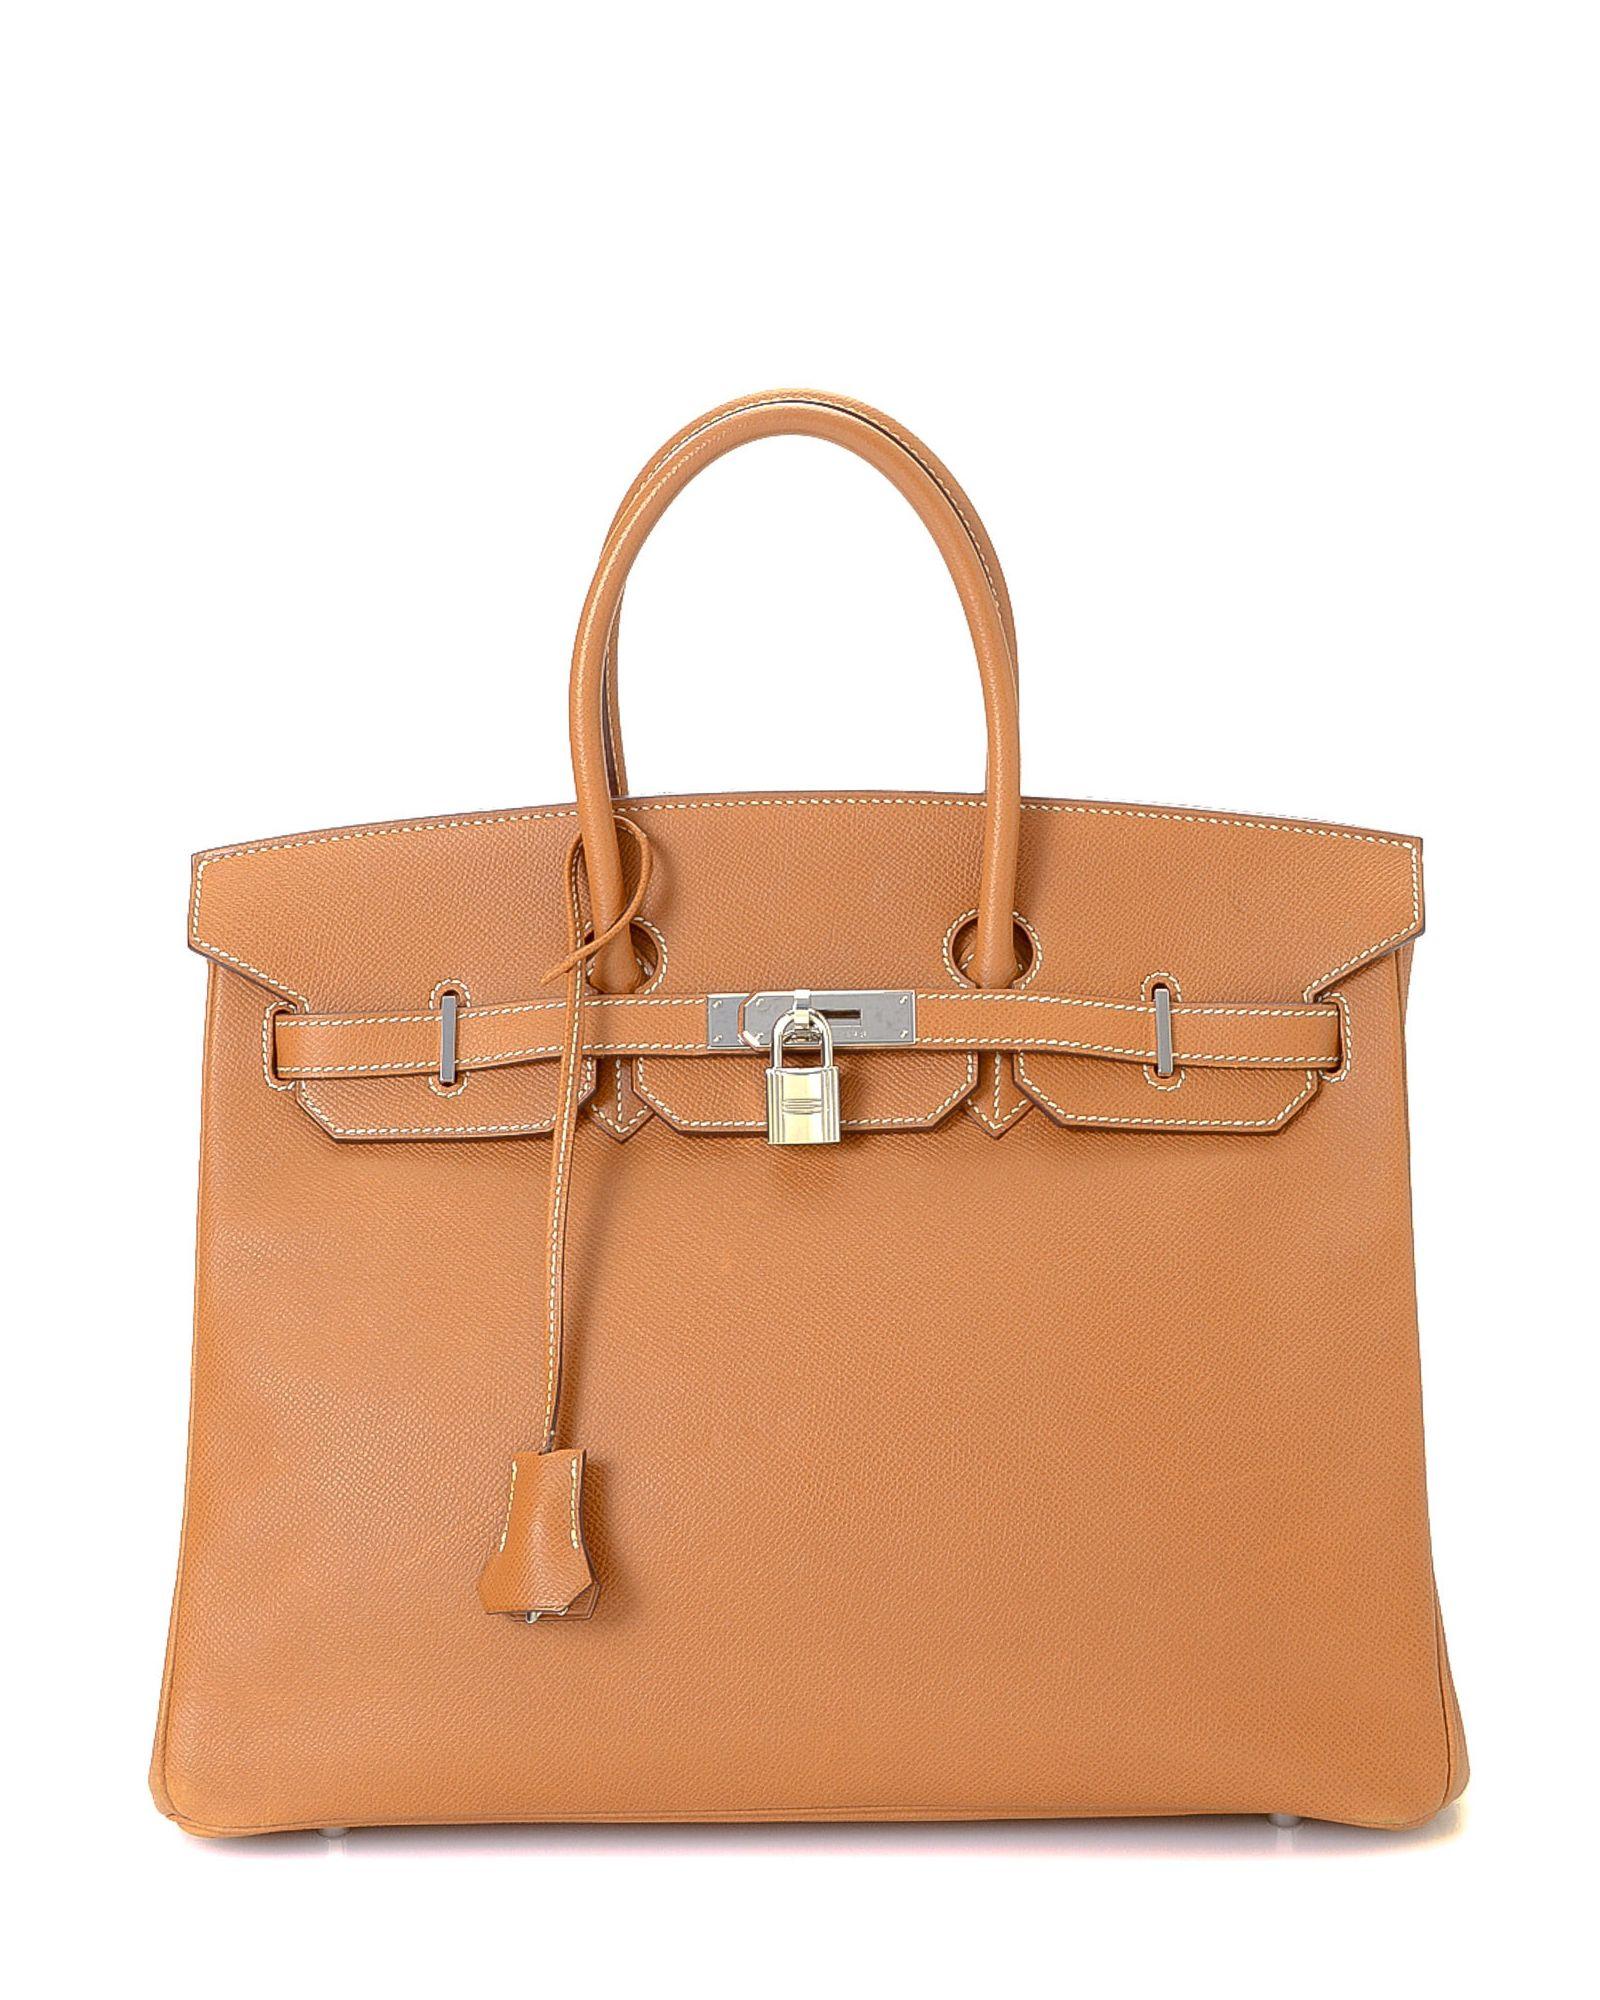 6bc54f0e6f65 Hermes Birkin 35 Epsom Handbag - Vintage